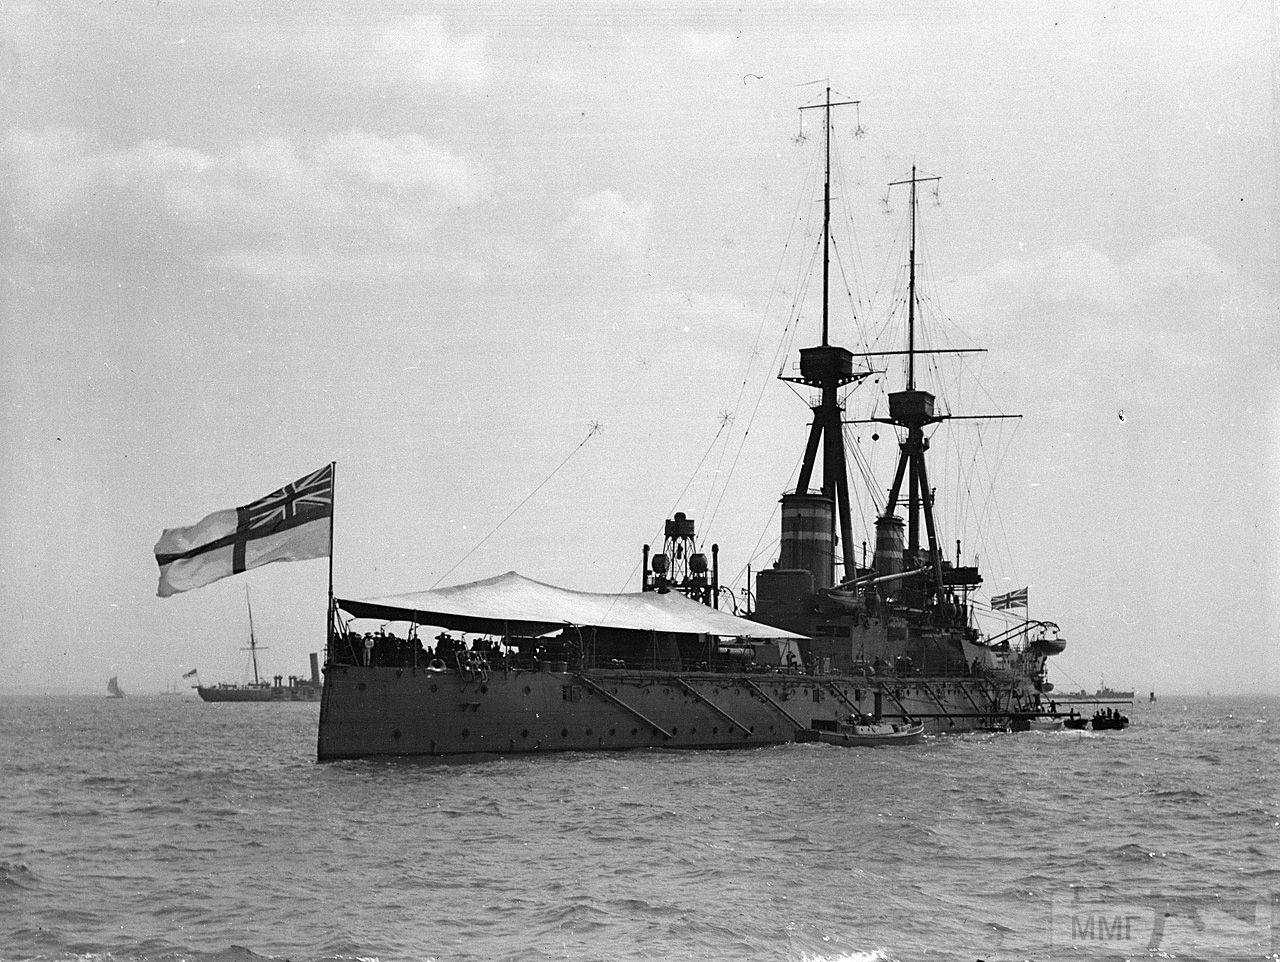 37518 - HMS Temeraire